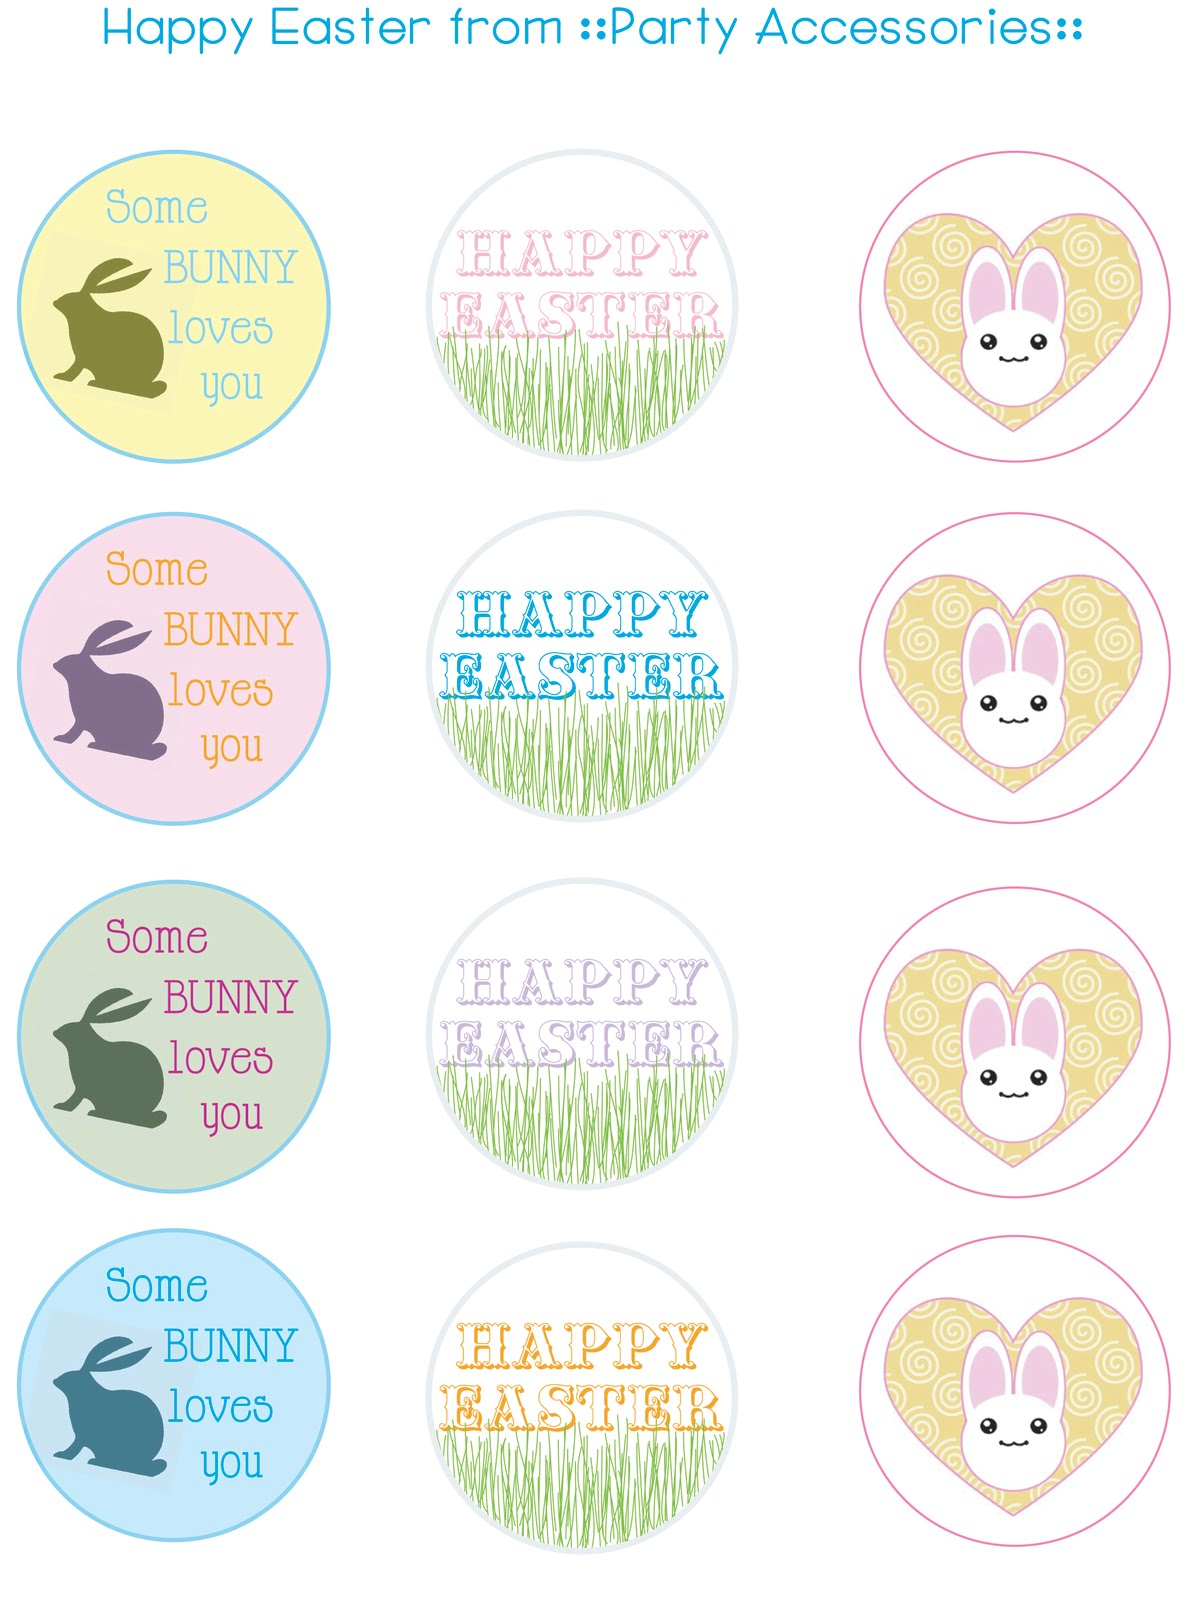 http://1.bp.blogspot.com/_ZZqbsKwbQHI/S7AeHjRERLI/AAAAAAAAFoM/iAsJ1NBwTvs/s1600/easter+cupcake+toppers.jpg